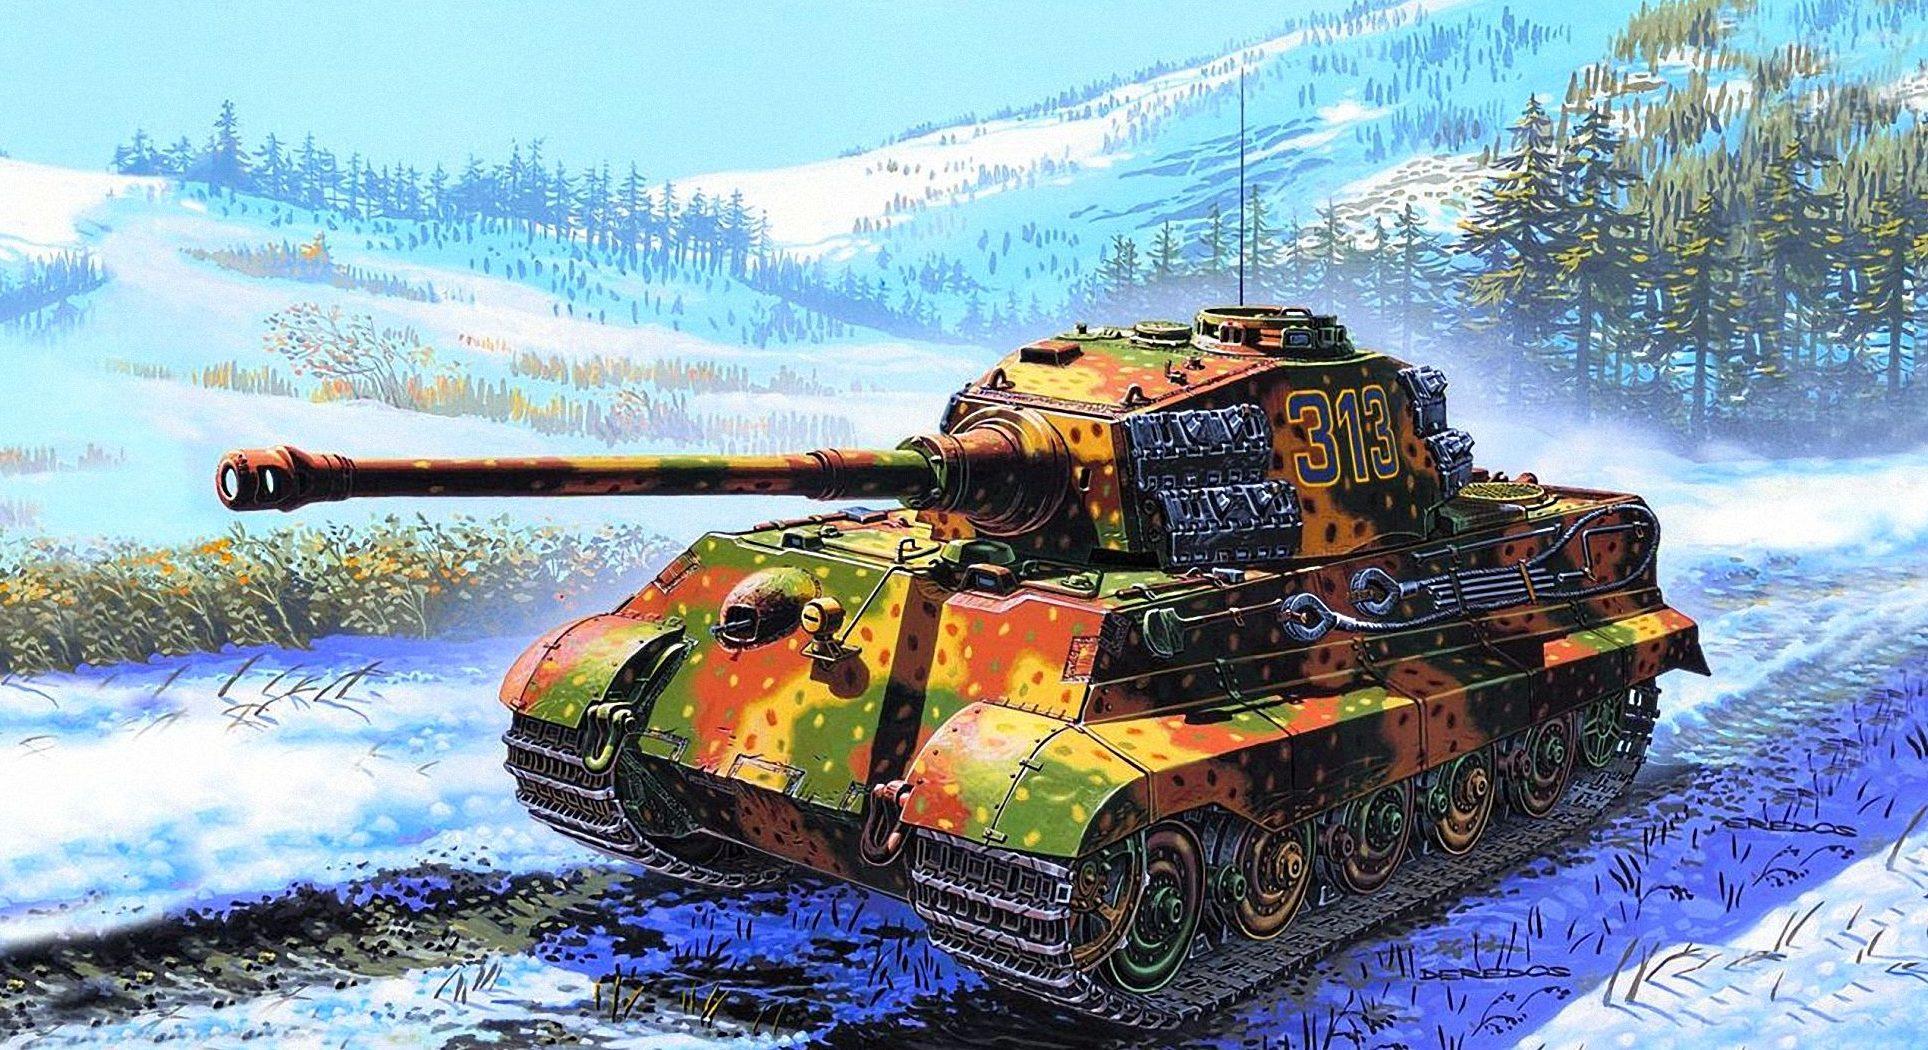 Deredos Andrzej. Танк Pz.Kpfw. VI (Tiger II).